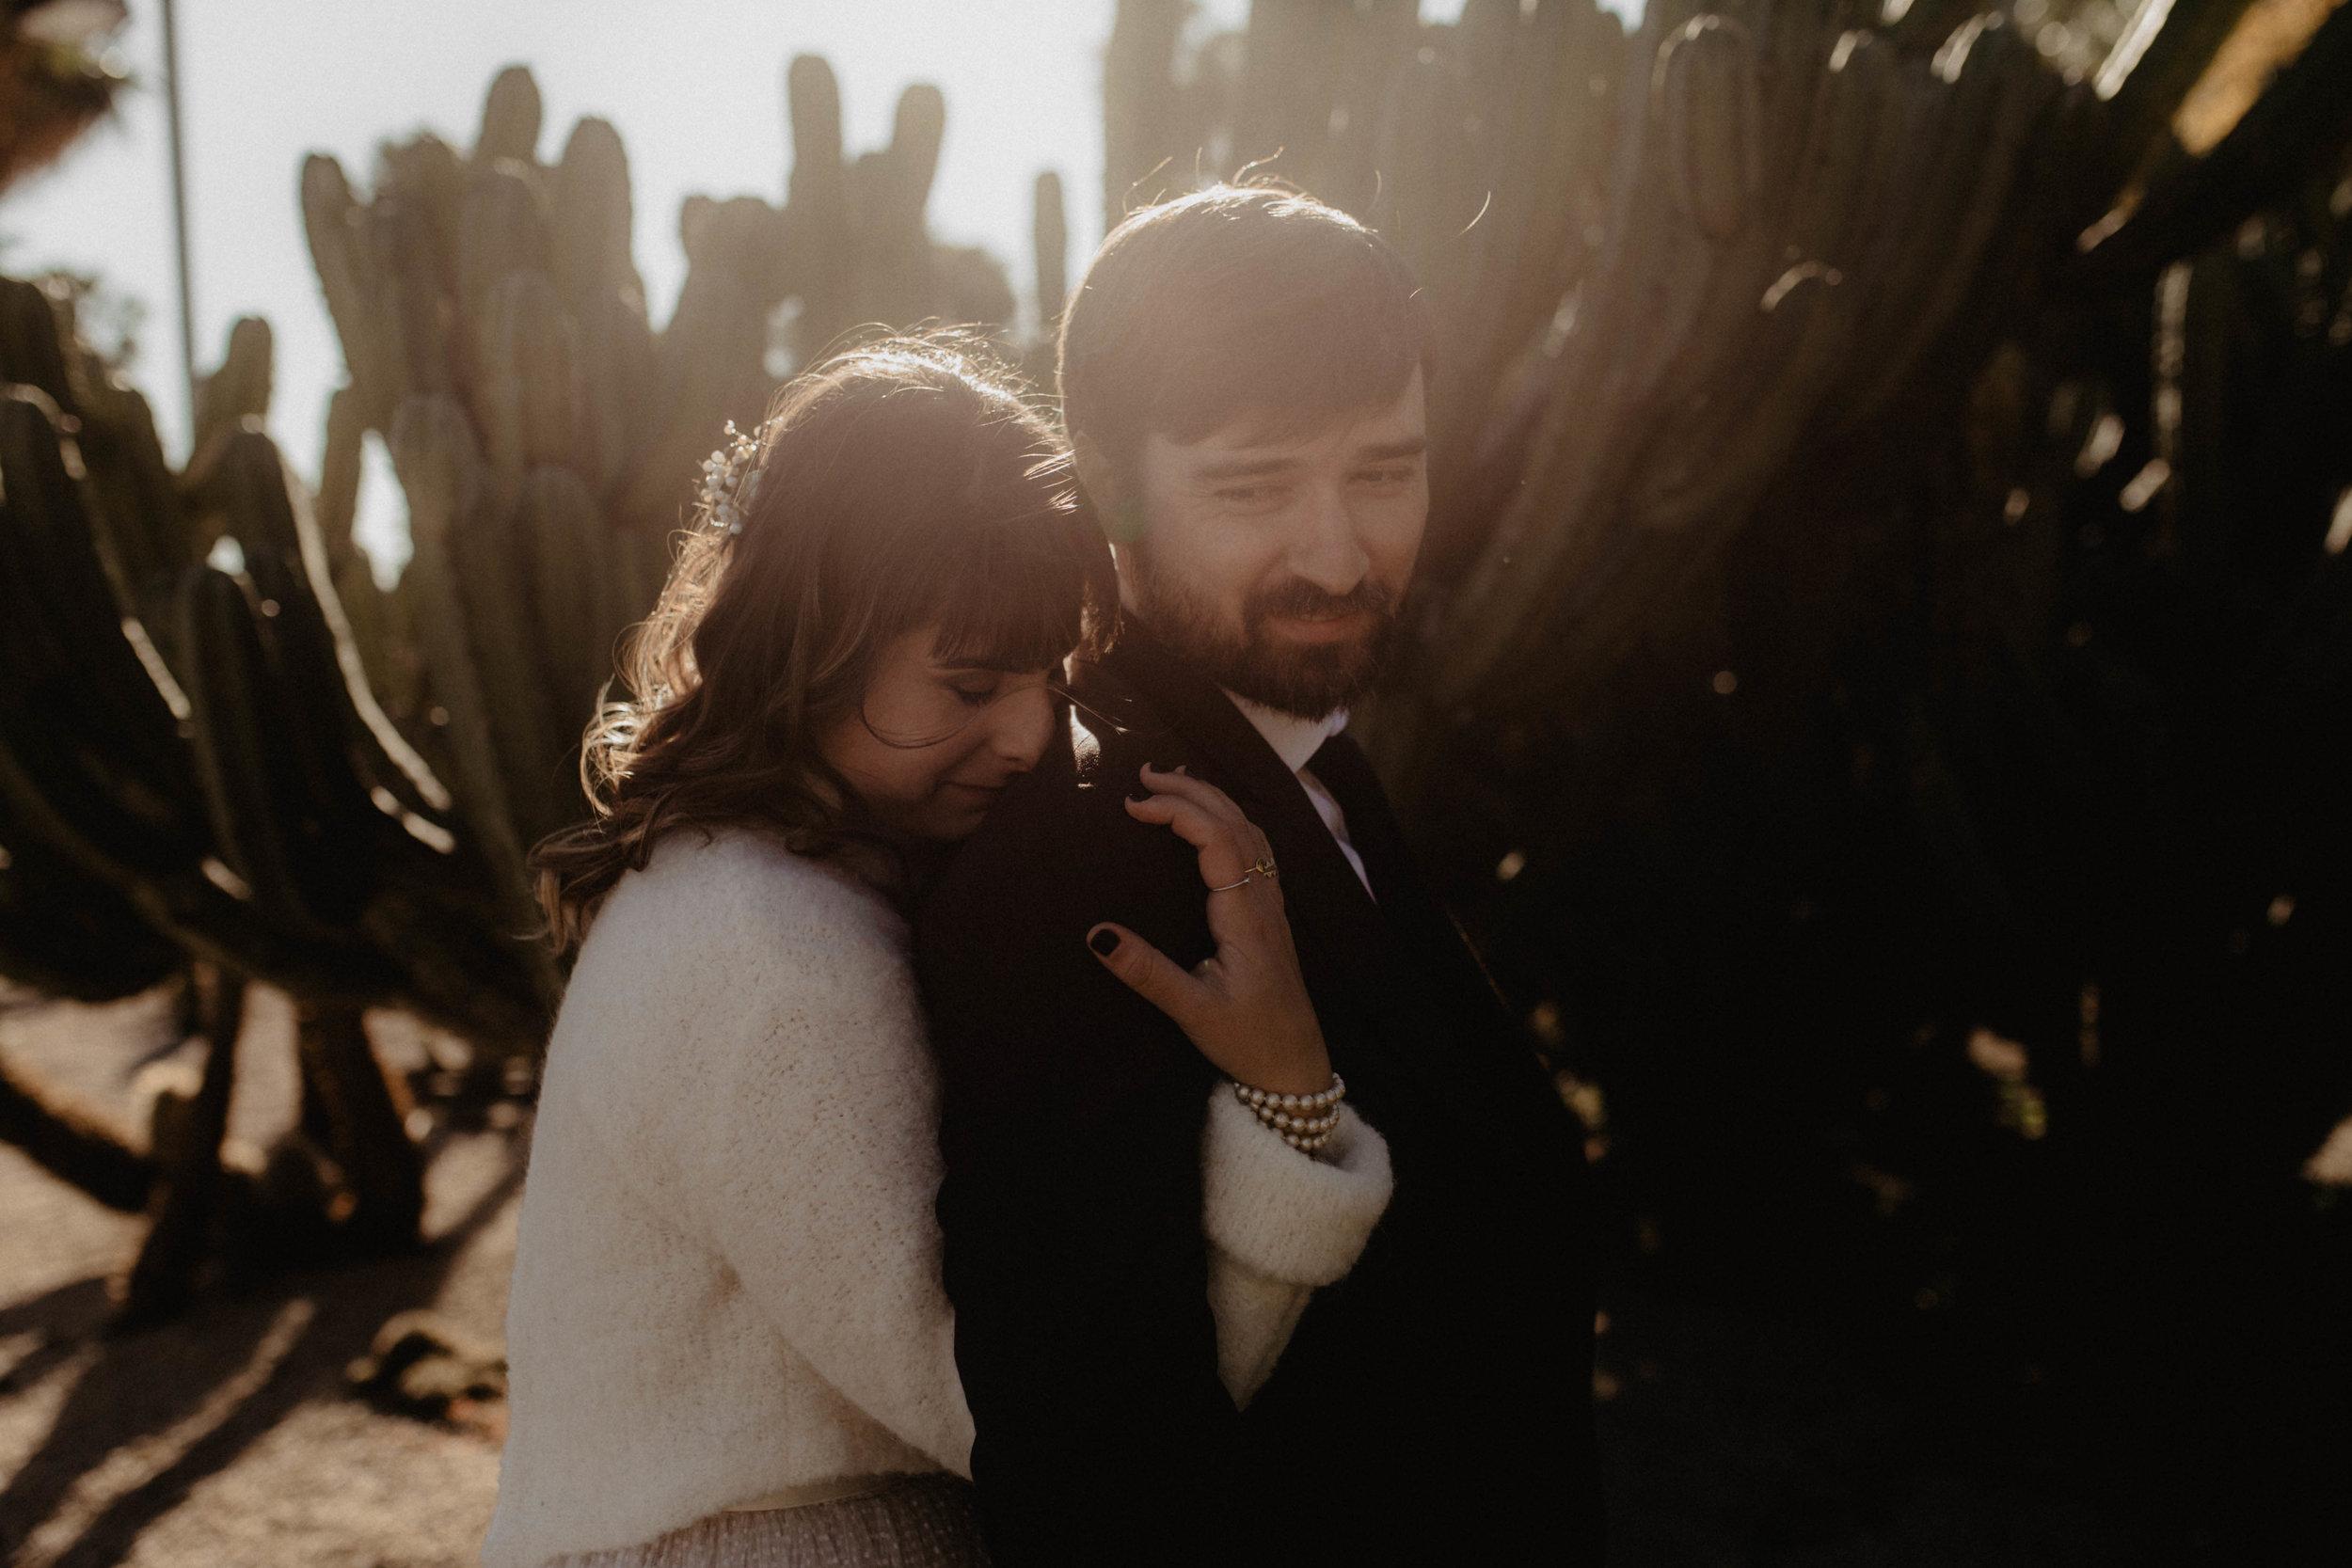 thenortherngirlphotography-photography-weddingphotography-couple-bodasconestilo-bodasenbarcelona-martadavid-287.jpg